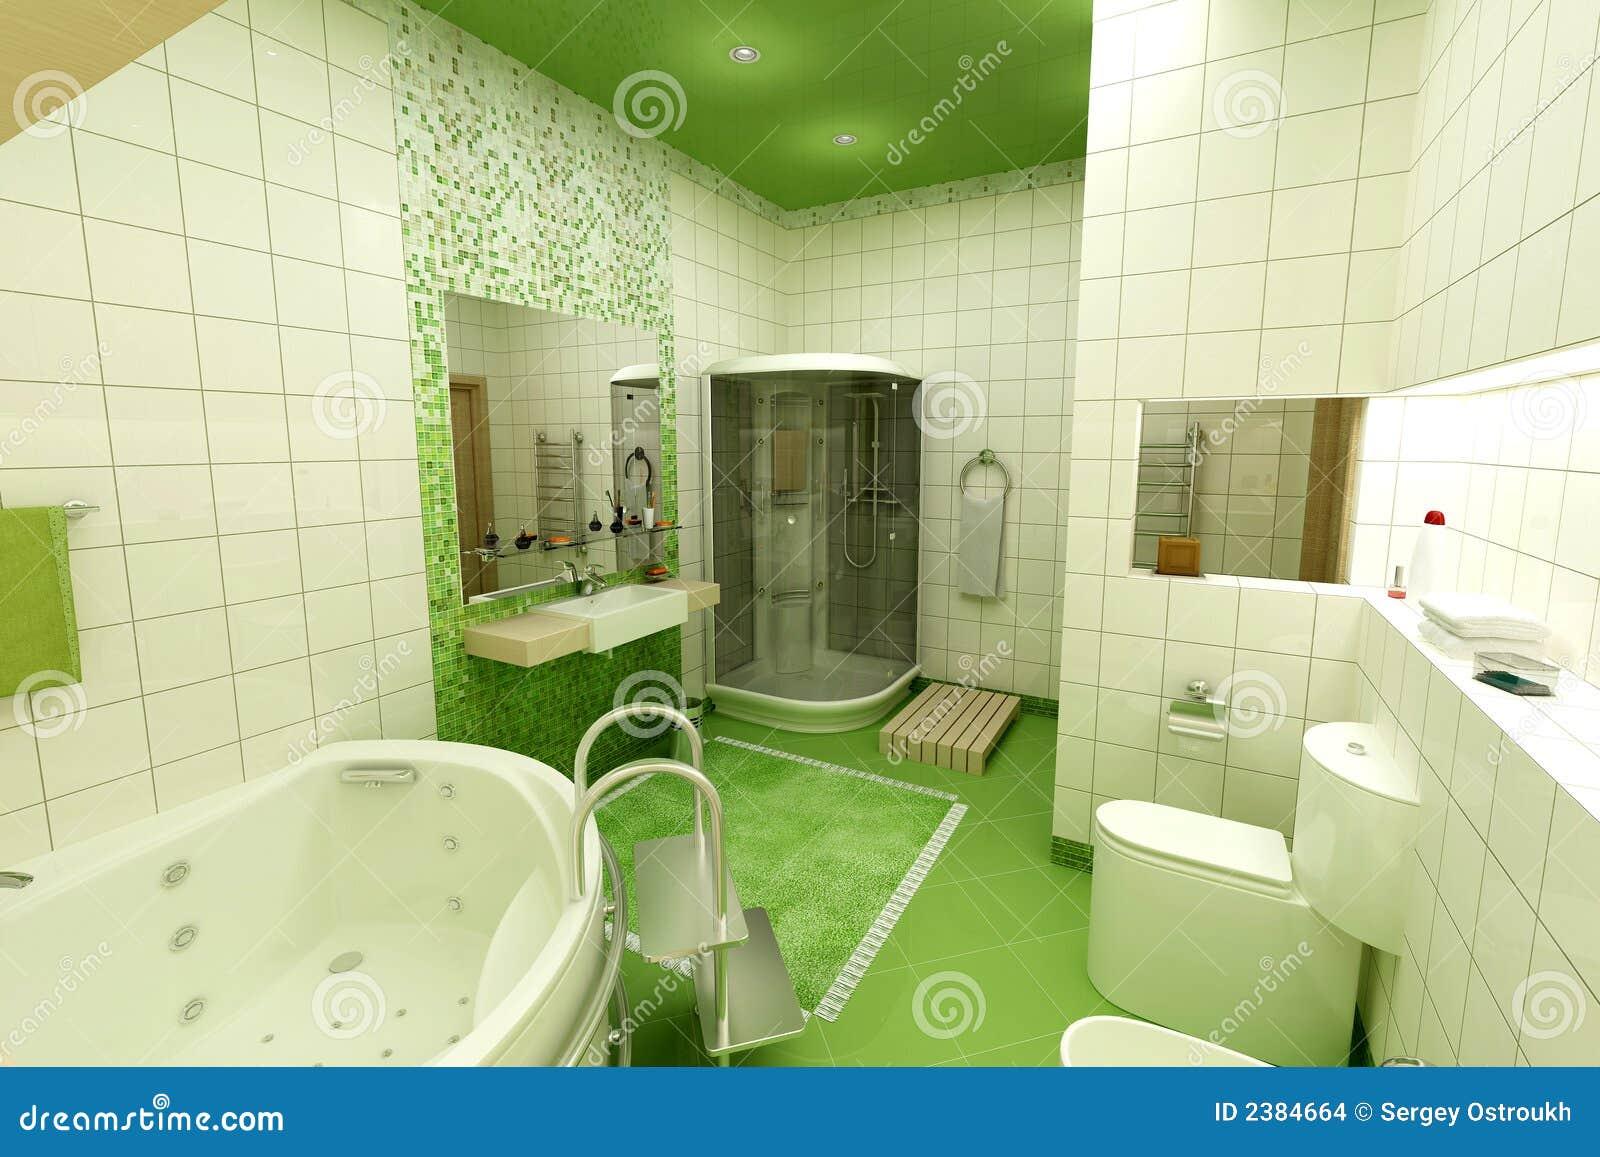 Rivestimento Bagno Mosaico Verde : Arredo bagno mosaico verde acqua colore bagno consigli bagno